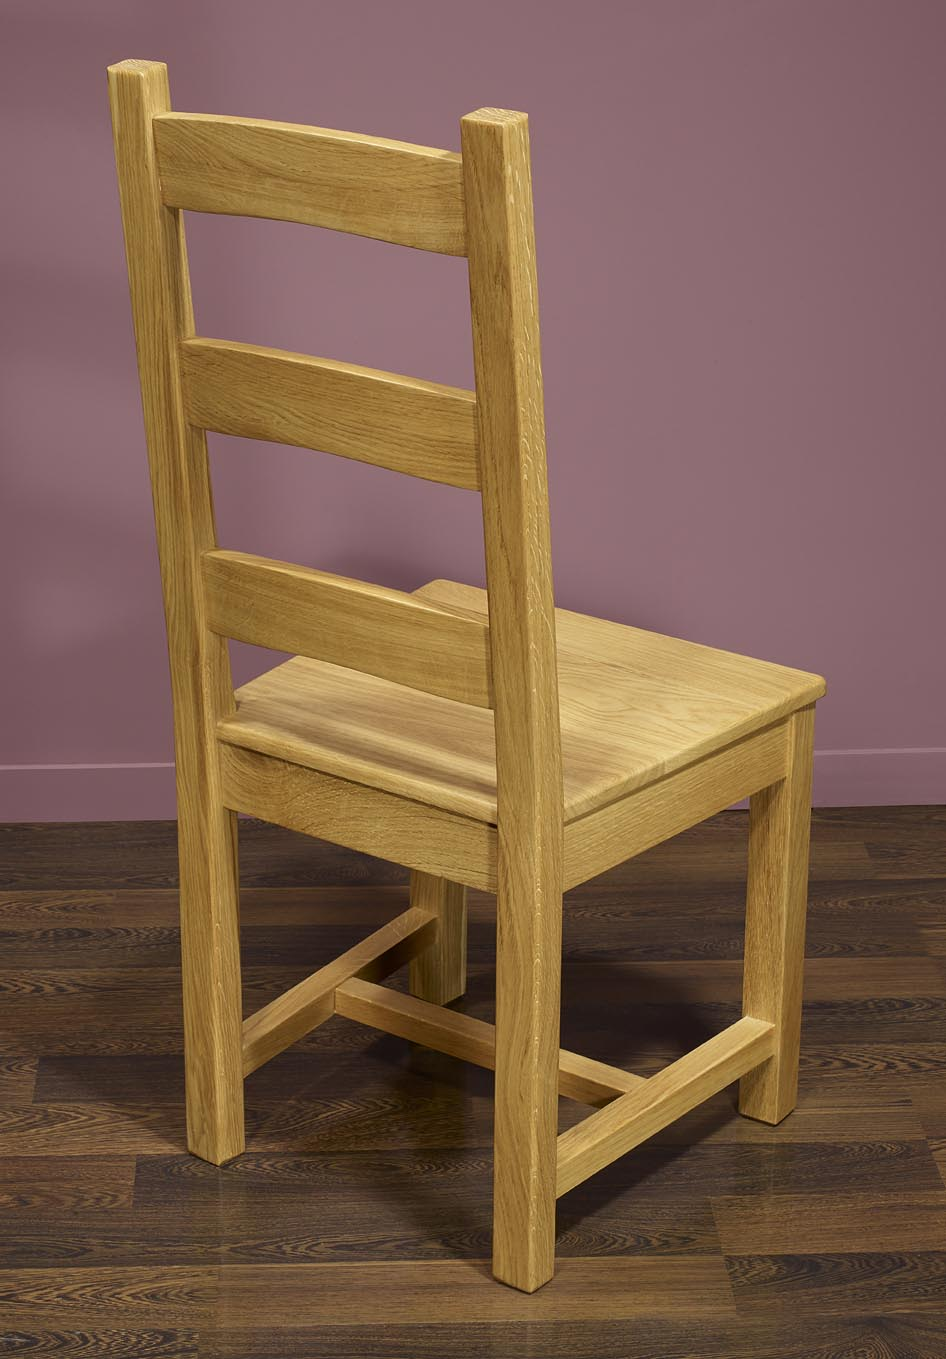 chaise en chne massif de style campagnard assise chene - Chaise En Chene